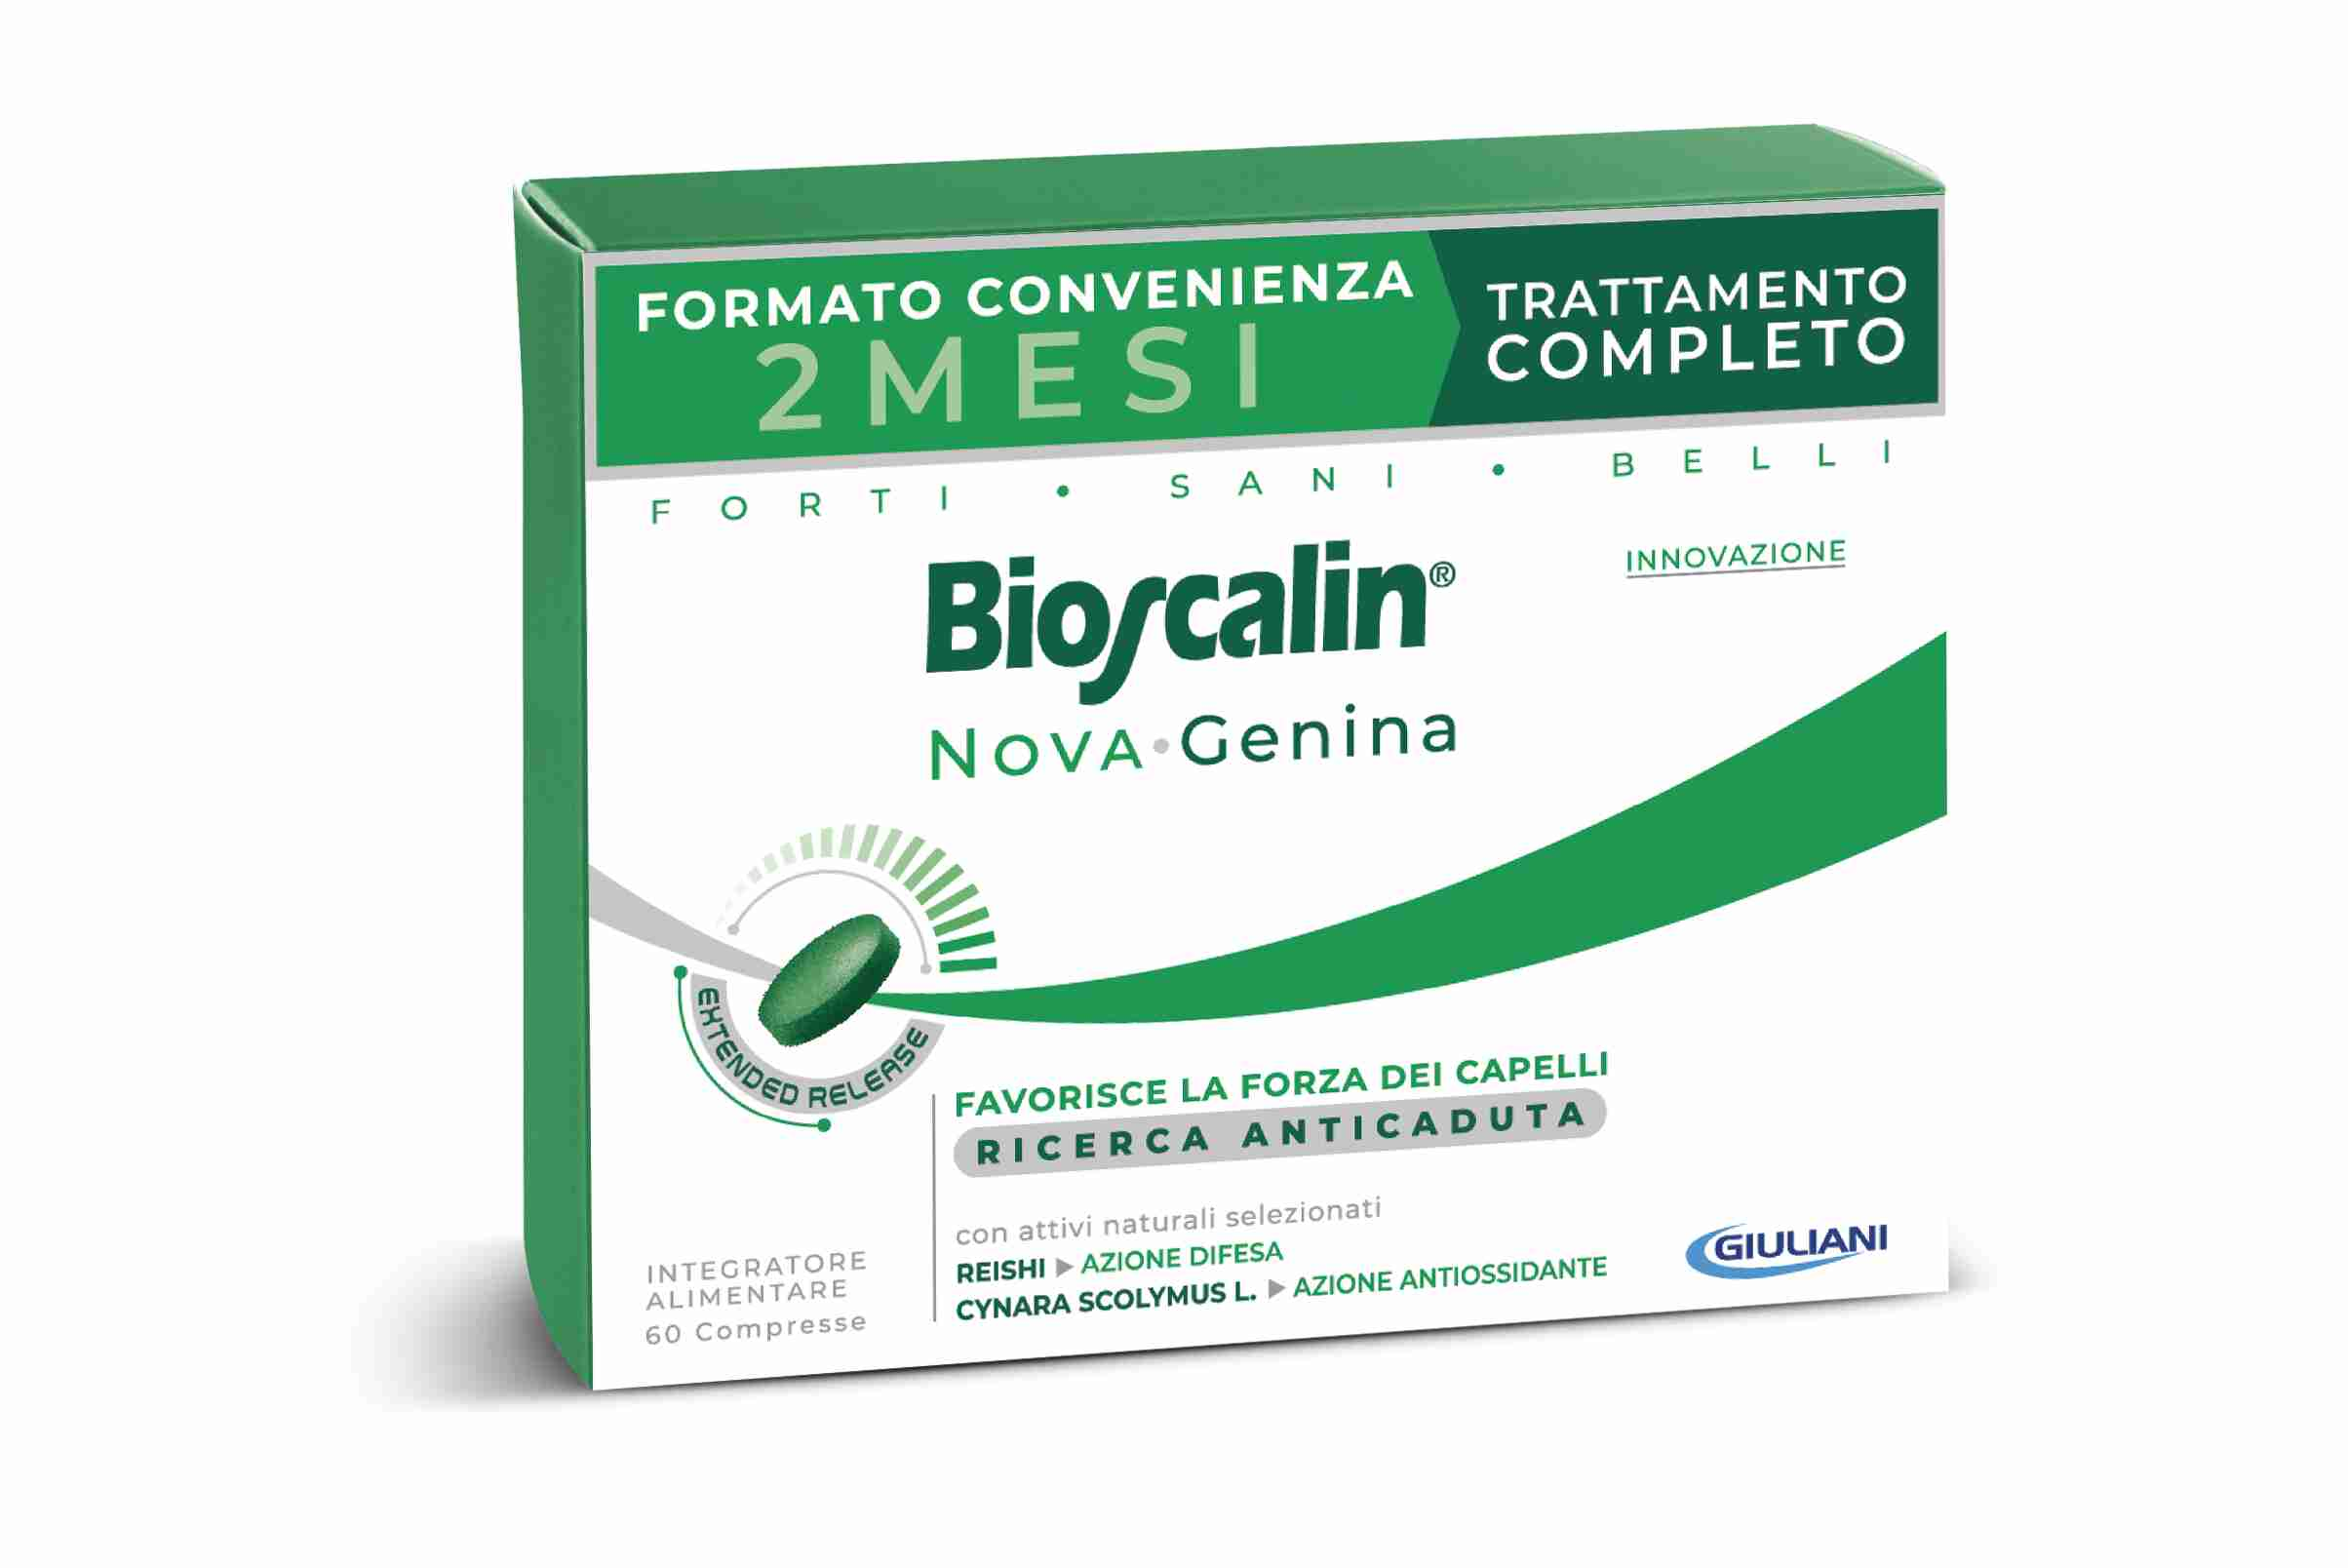 BIOSCALIN NOVA GENINA 60 COMPRESSE - Farmacianuova.eu